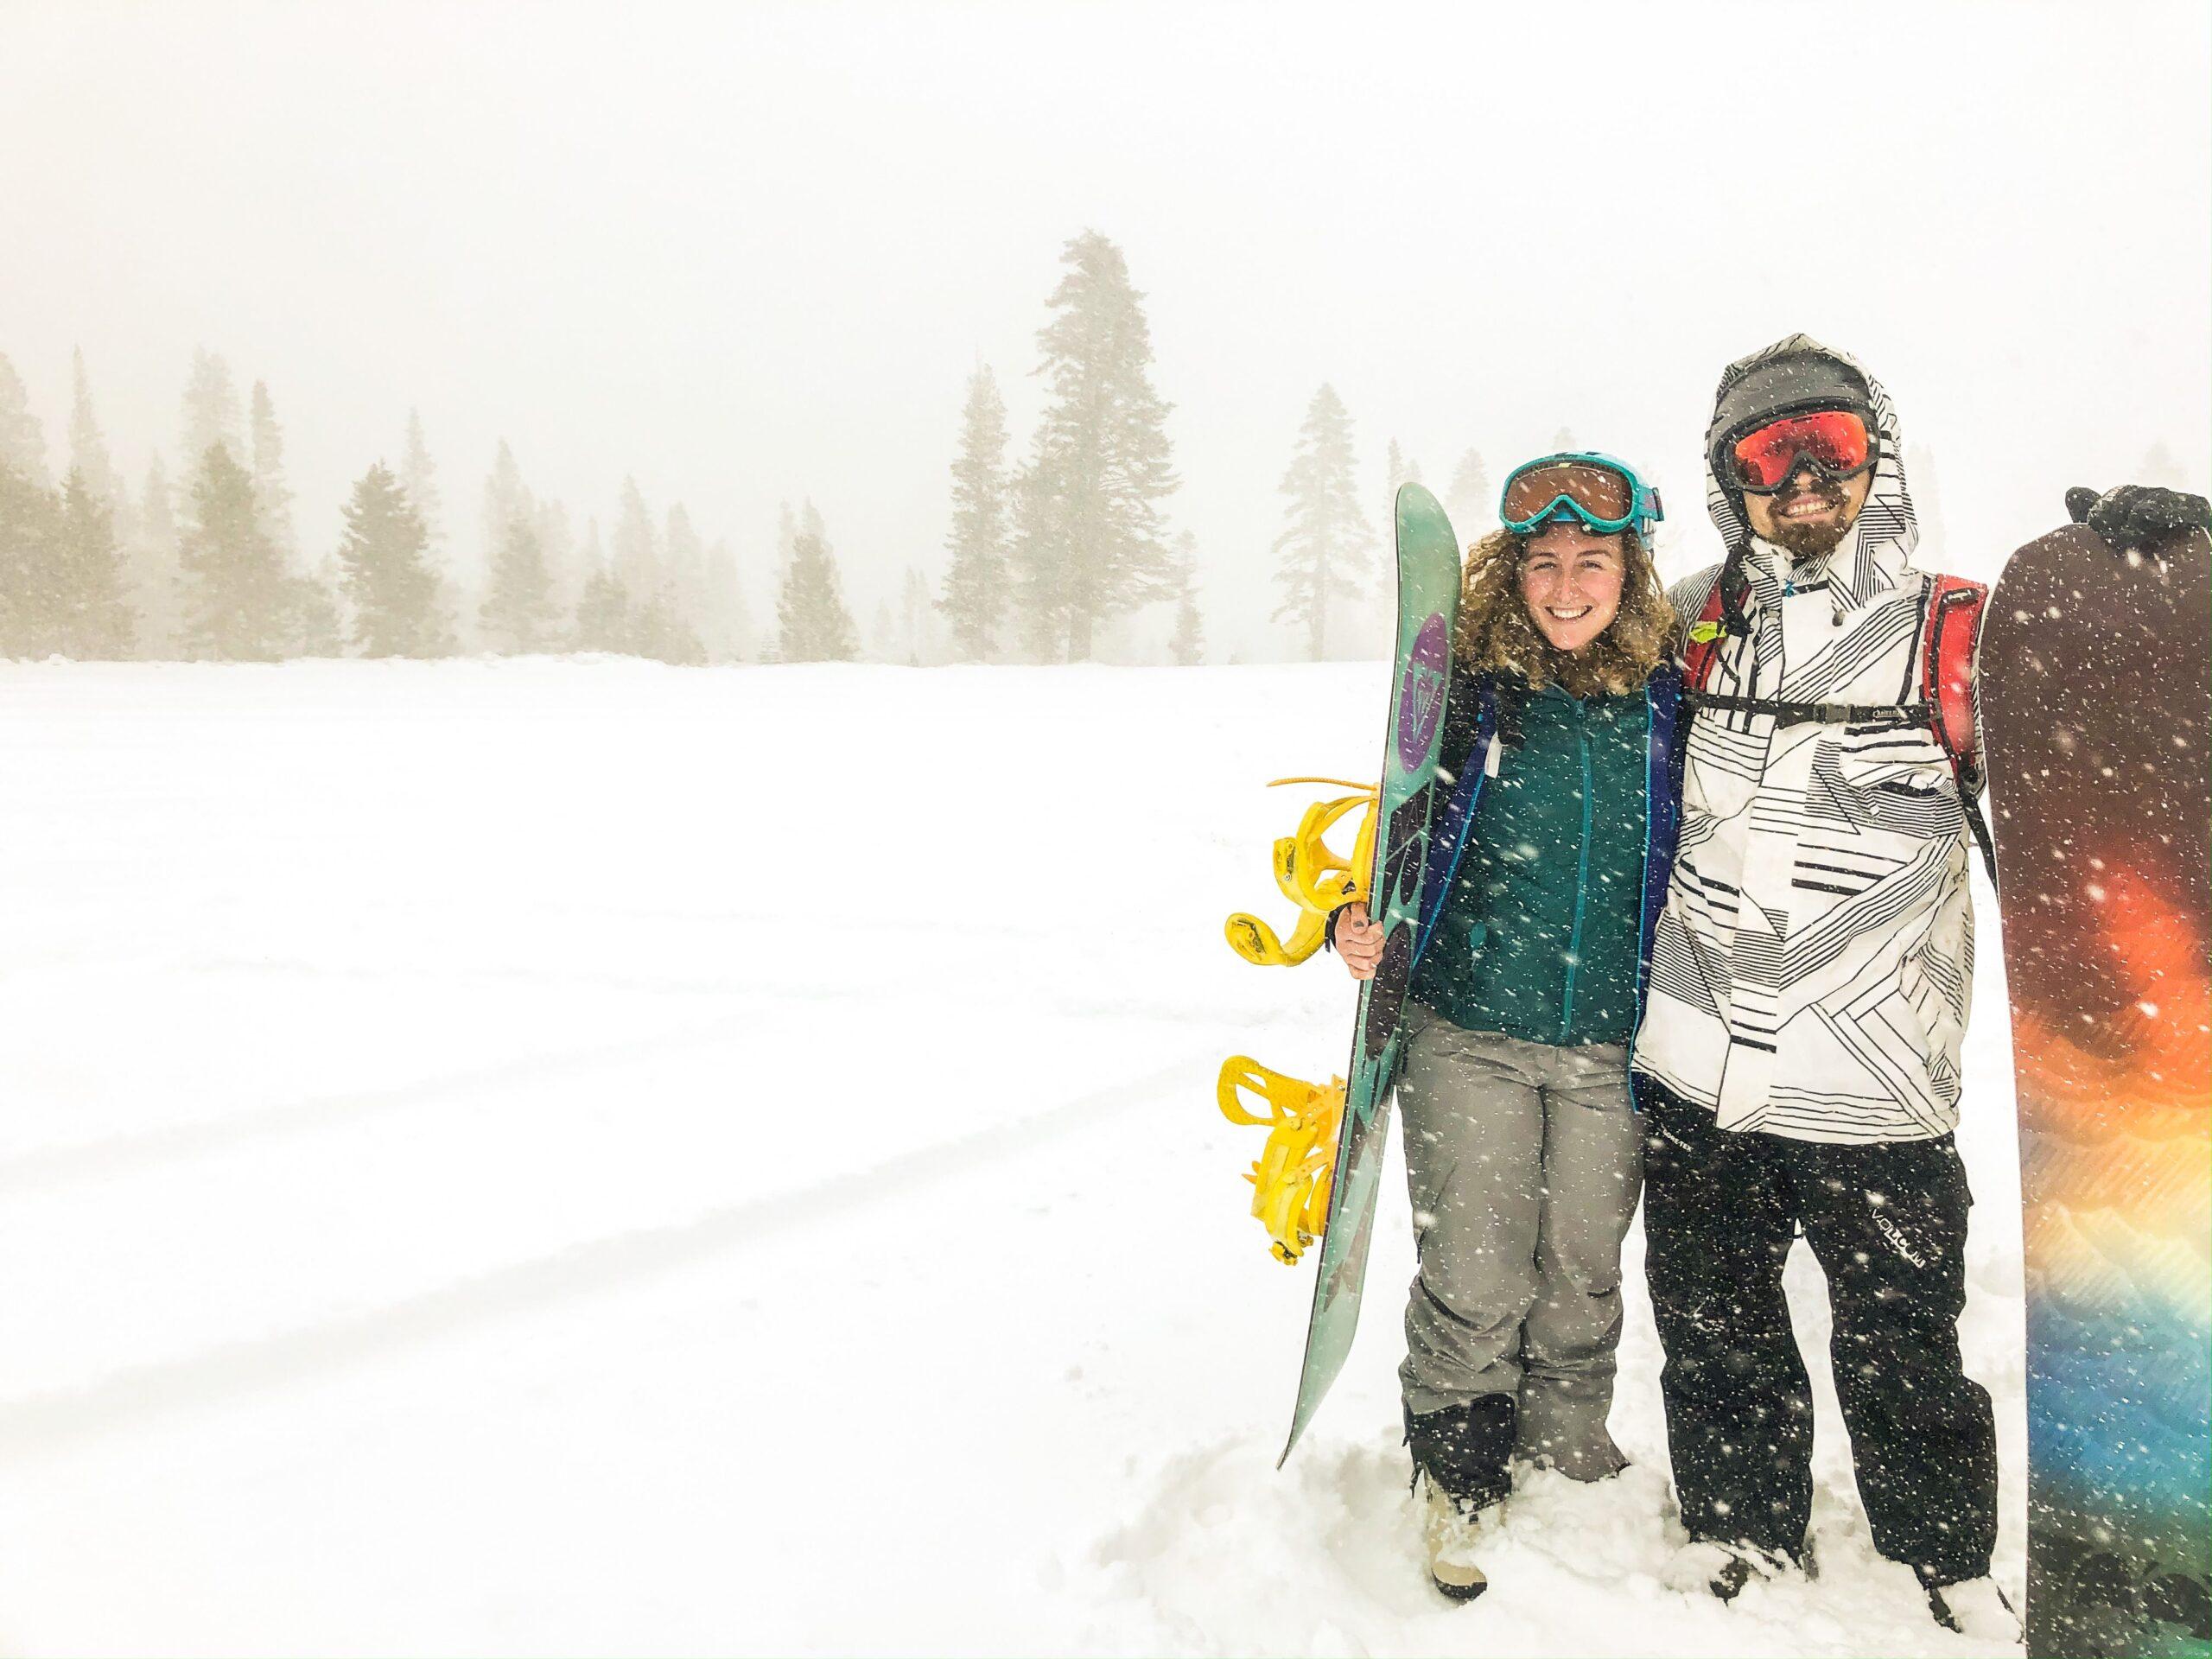 Kaya Lindsay Snowboard